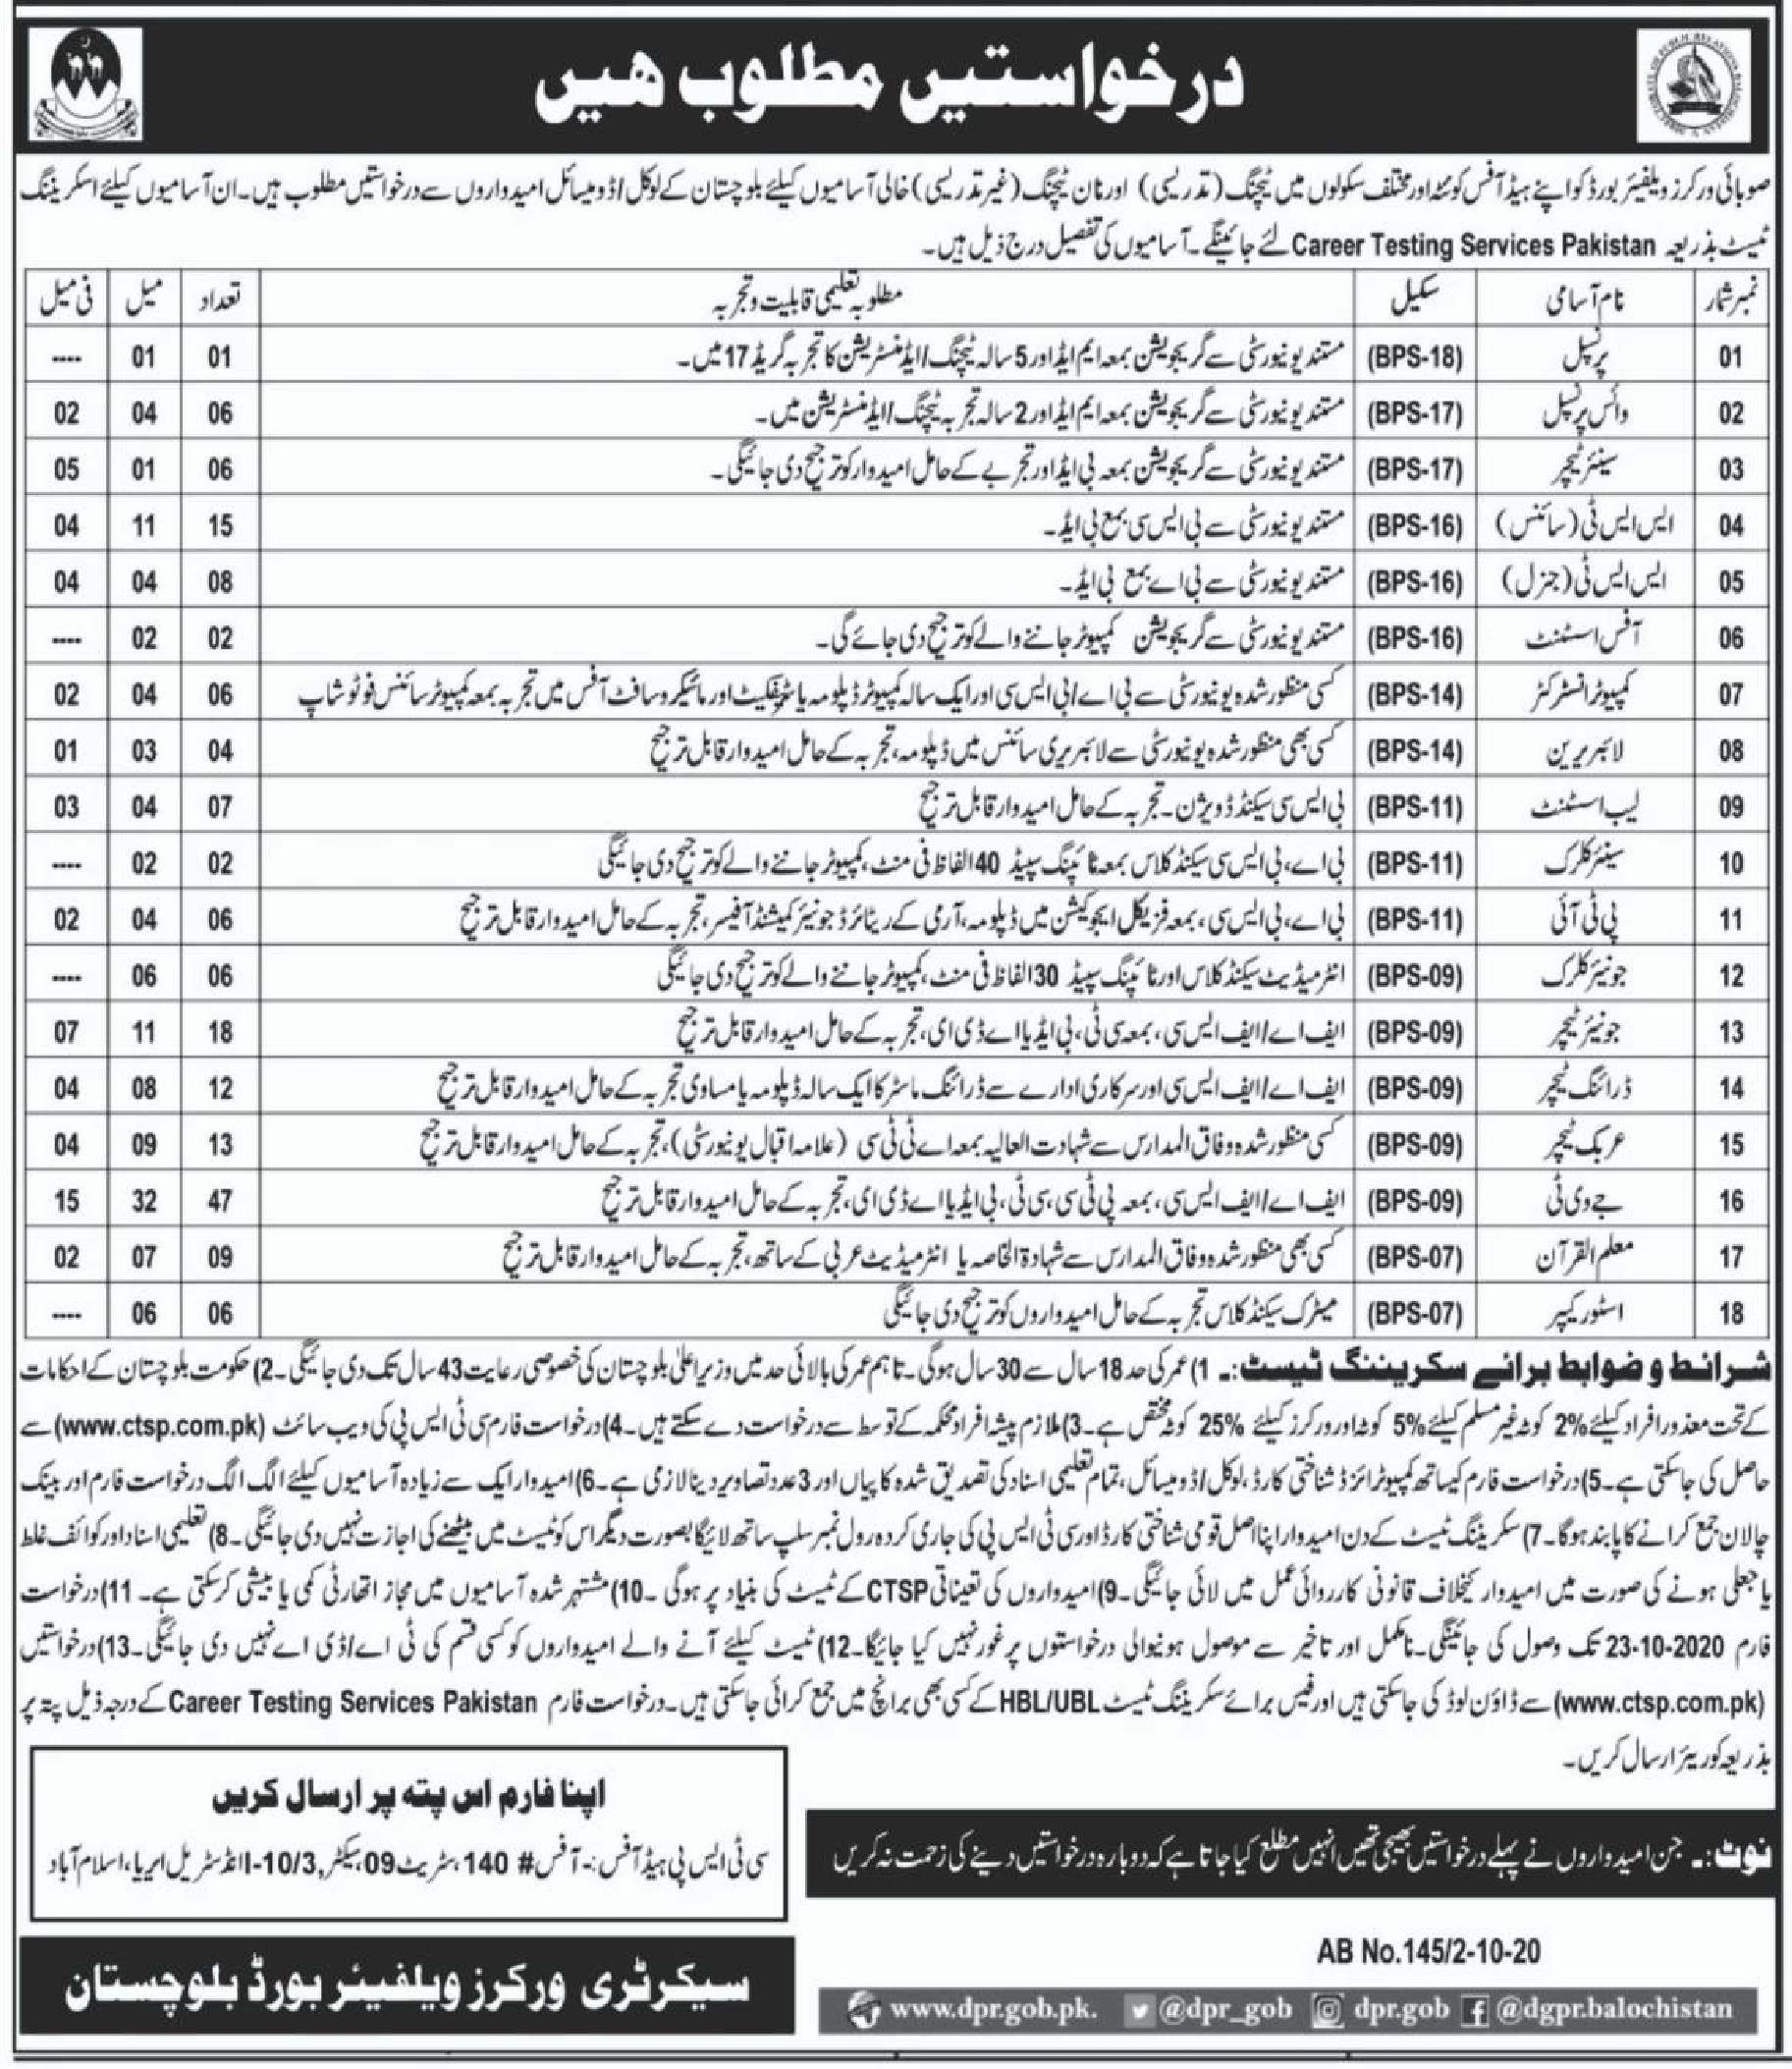 Workers Welfare Board Balochistan Teaching Jobs 2020 CTSP Application Form Roll No Slip Download Online